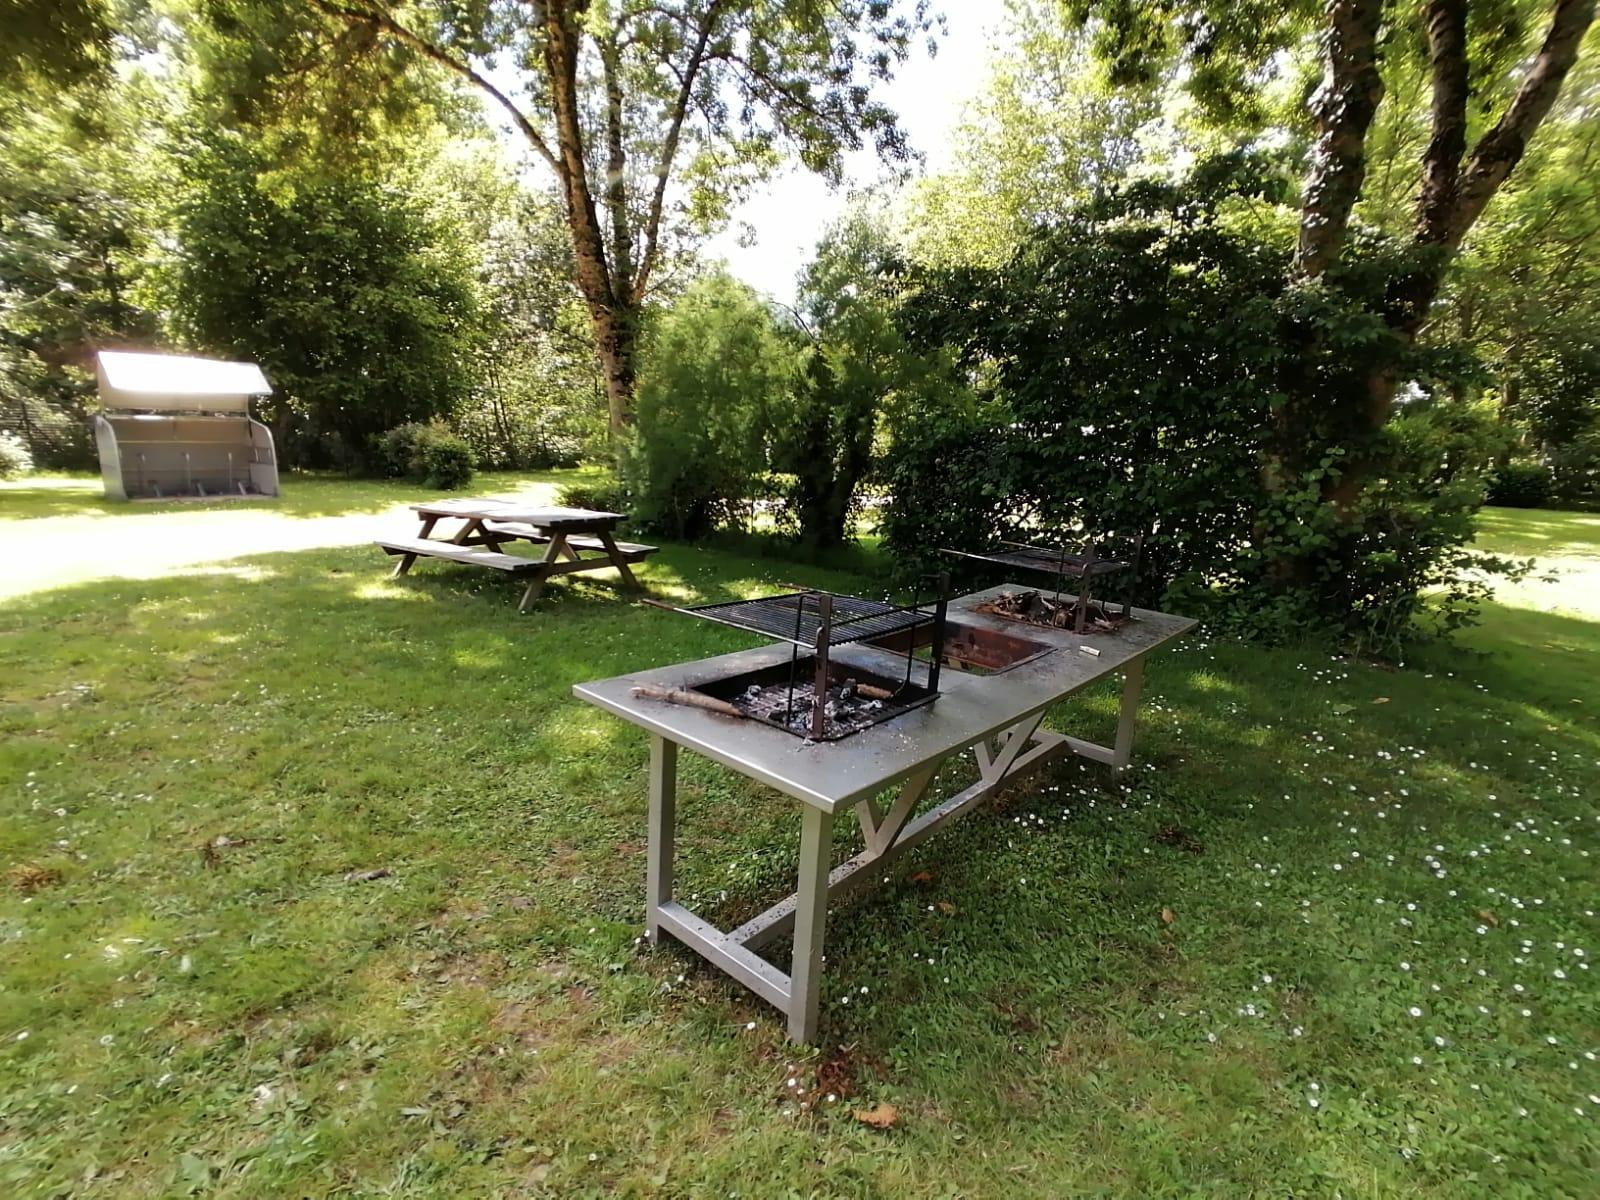 barbecue et table de pique-nique